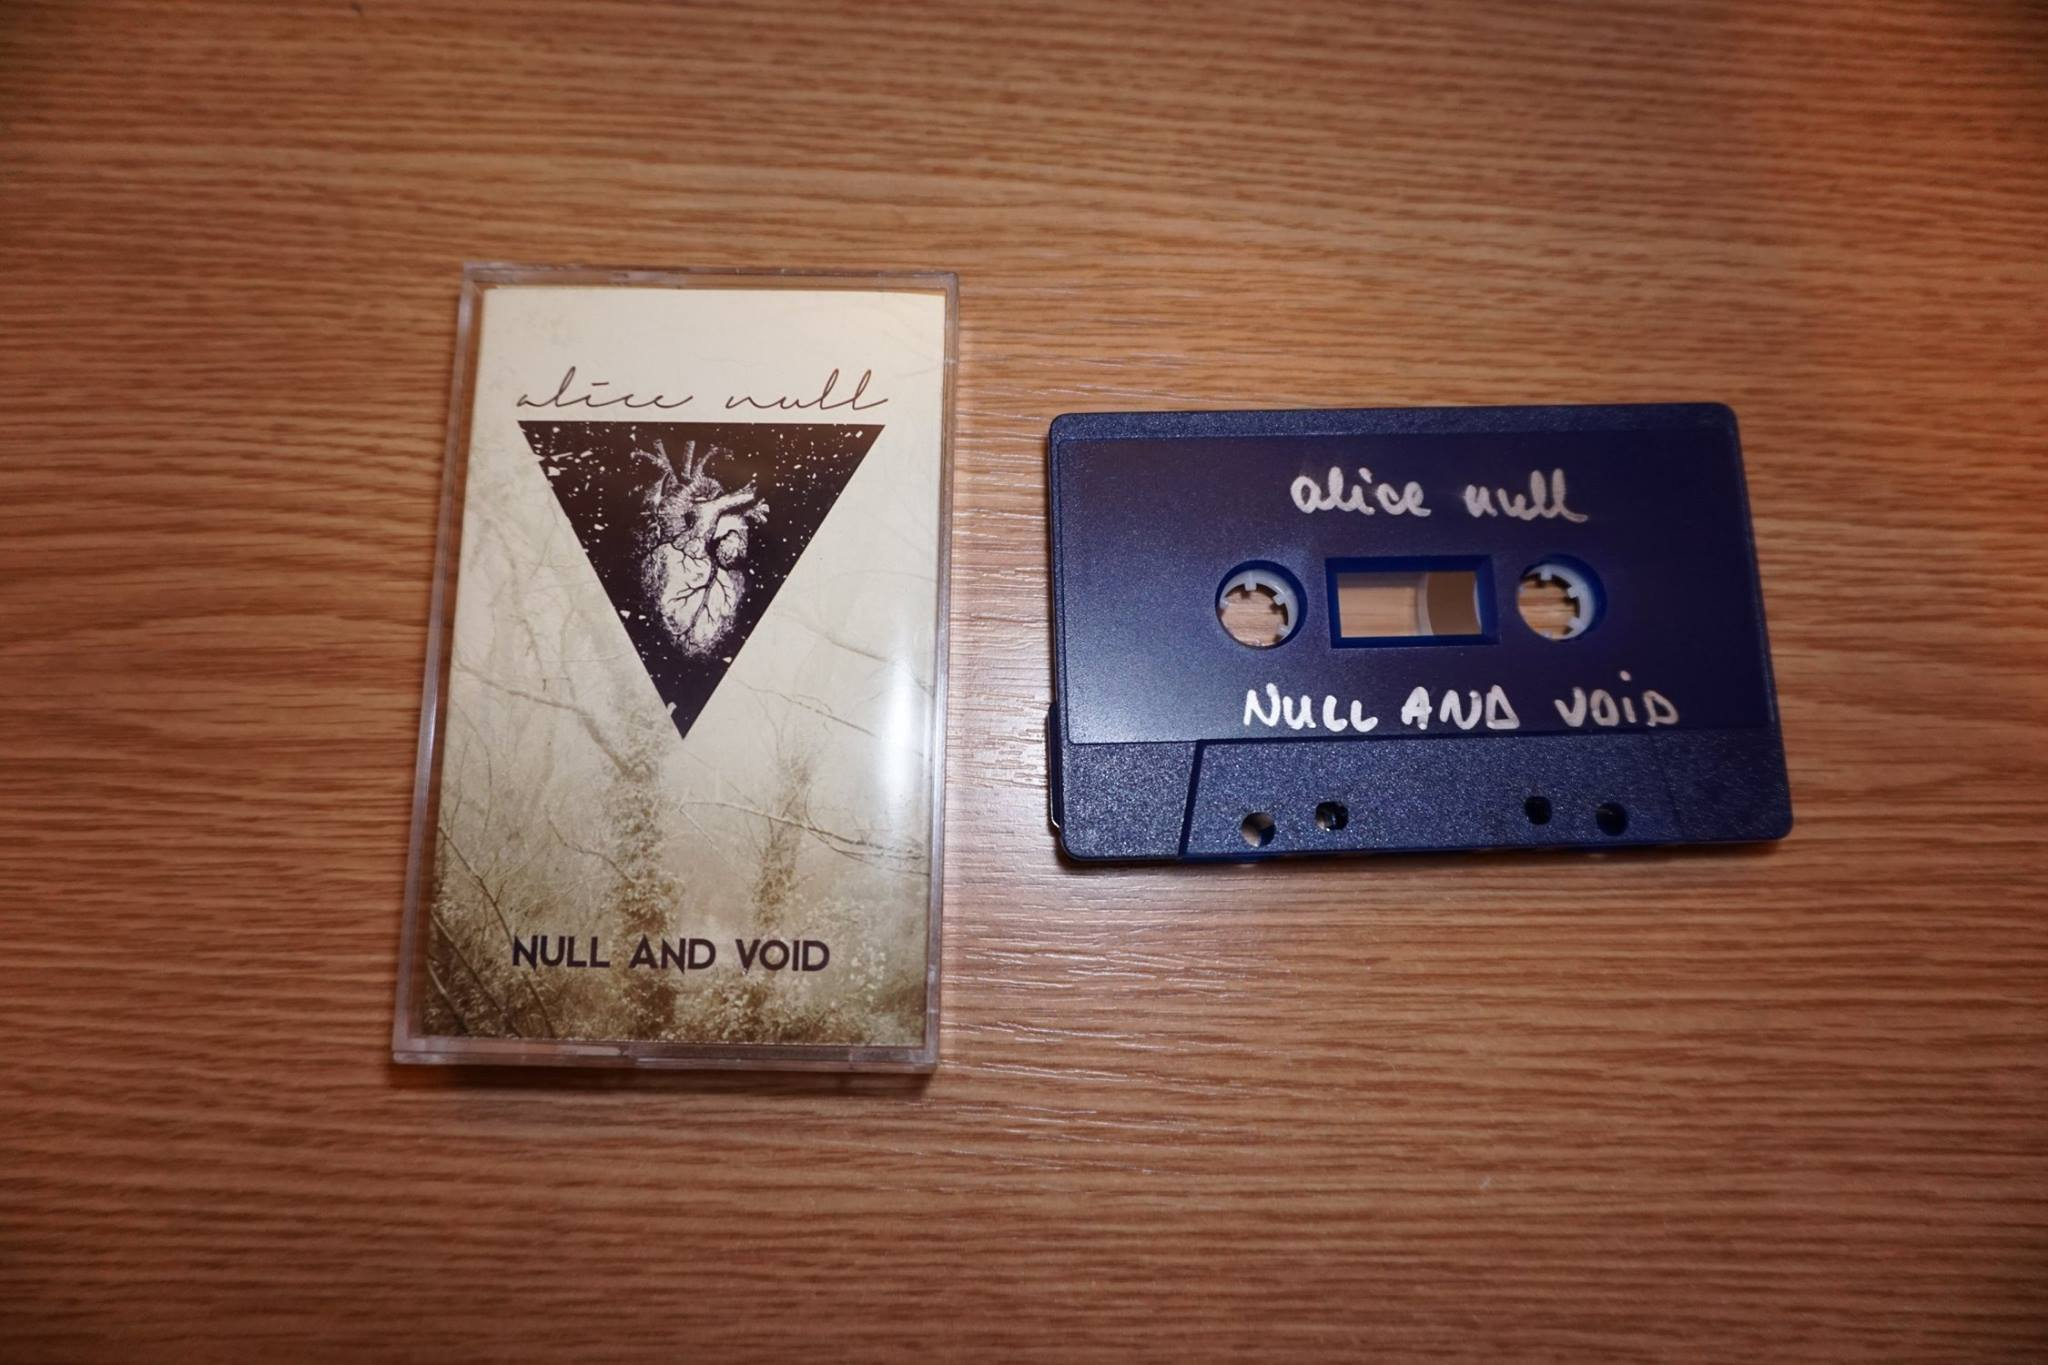 alice-null-caseta